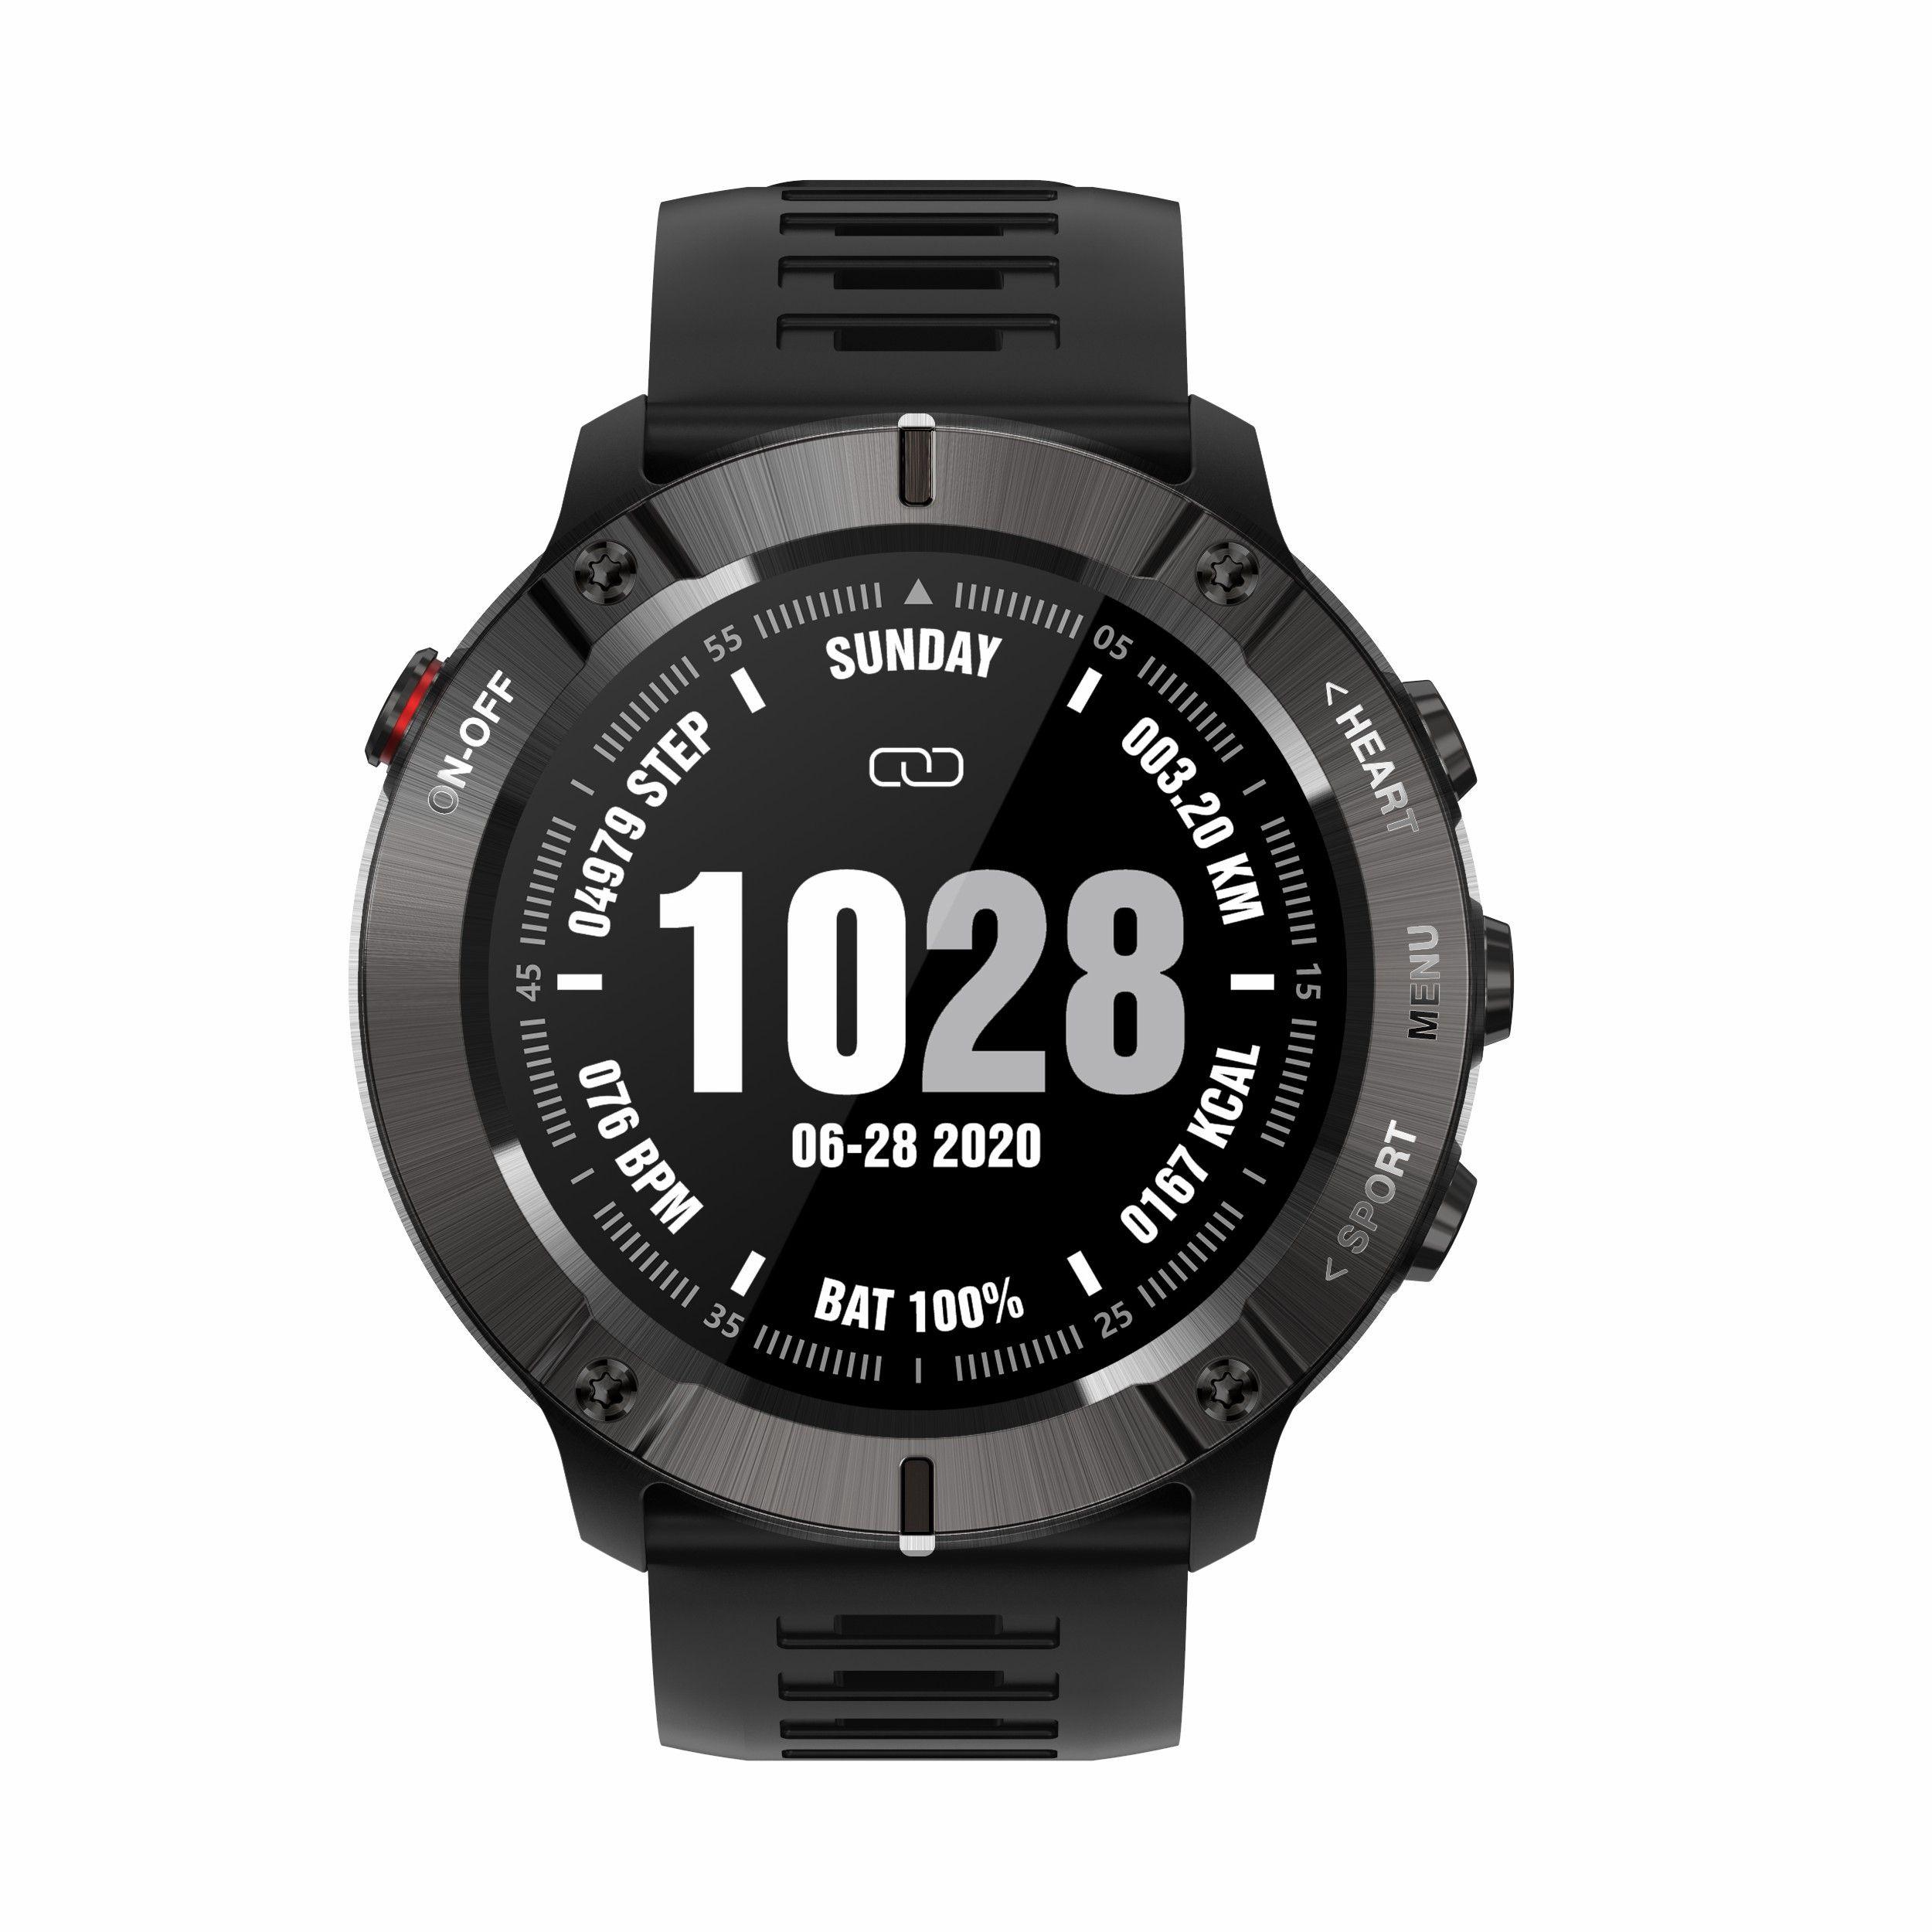 MC01 Smart Sports Watch Pedômetro Frequência Cardíaca Multi-Dial Interruptor Música Controle de Música Lembrete